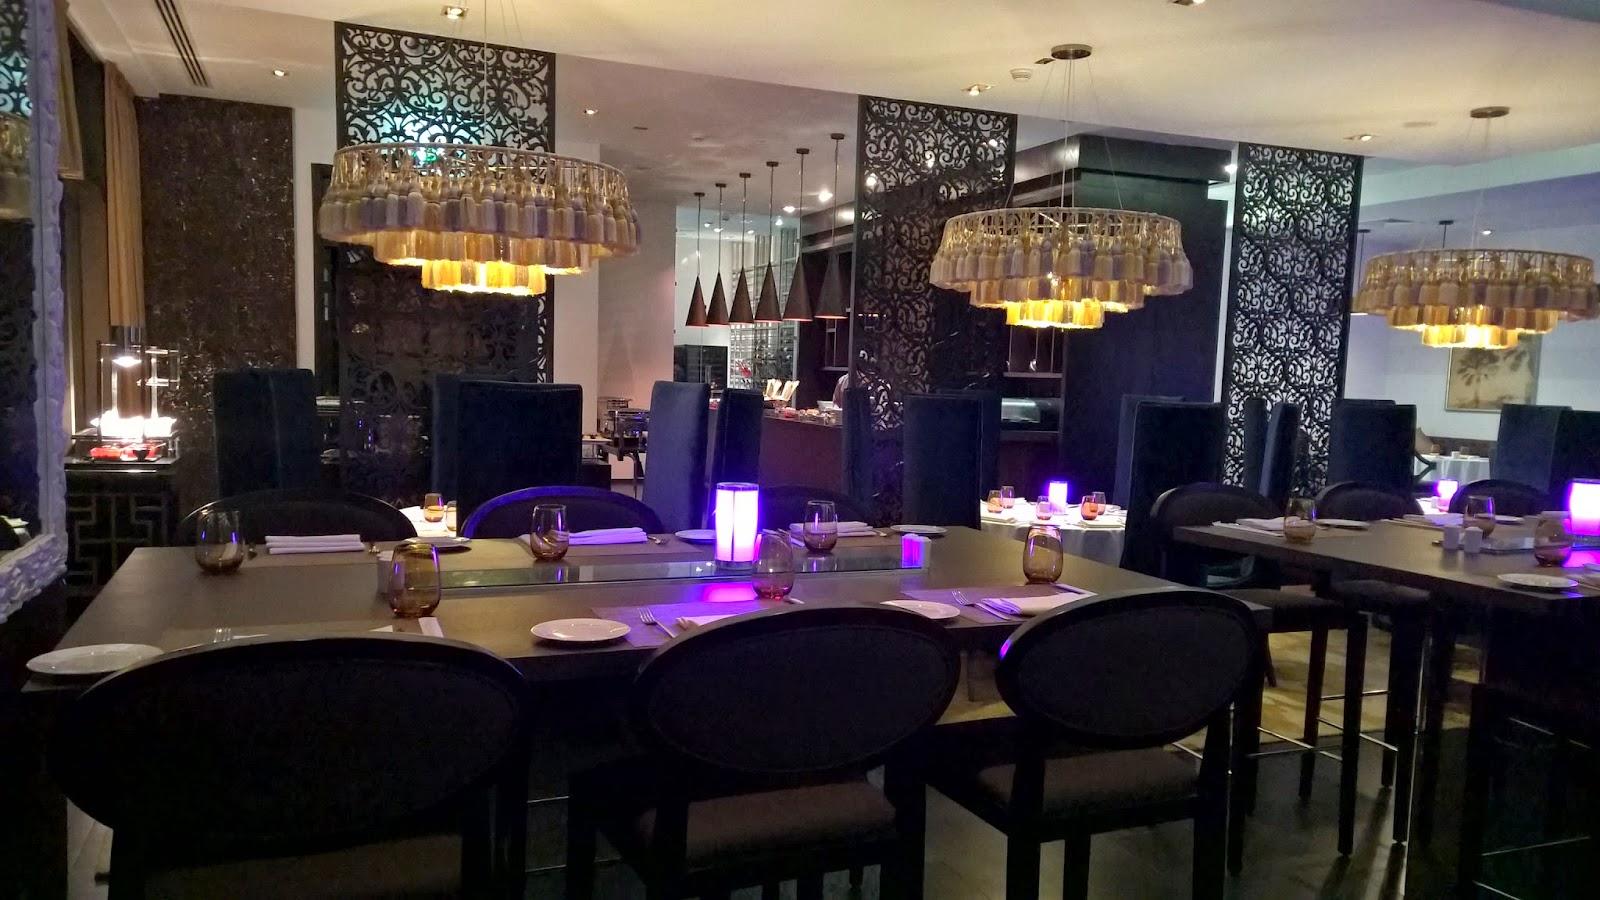 kahraman arabic restaurant southern sun hotel abu dhabi. Black Bedroom Furniture Sets. Home Design Ideas